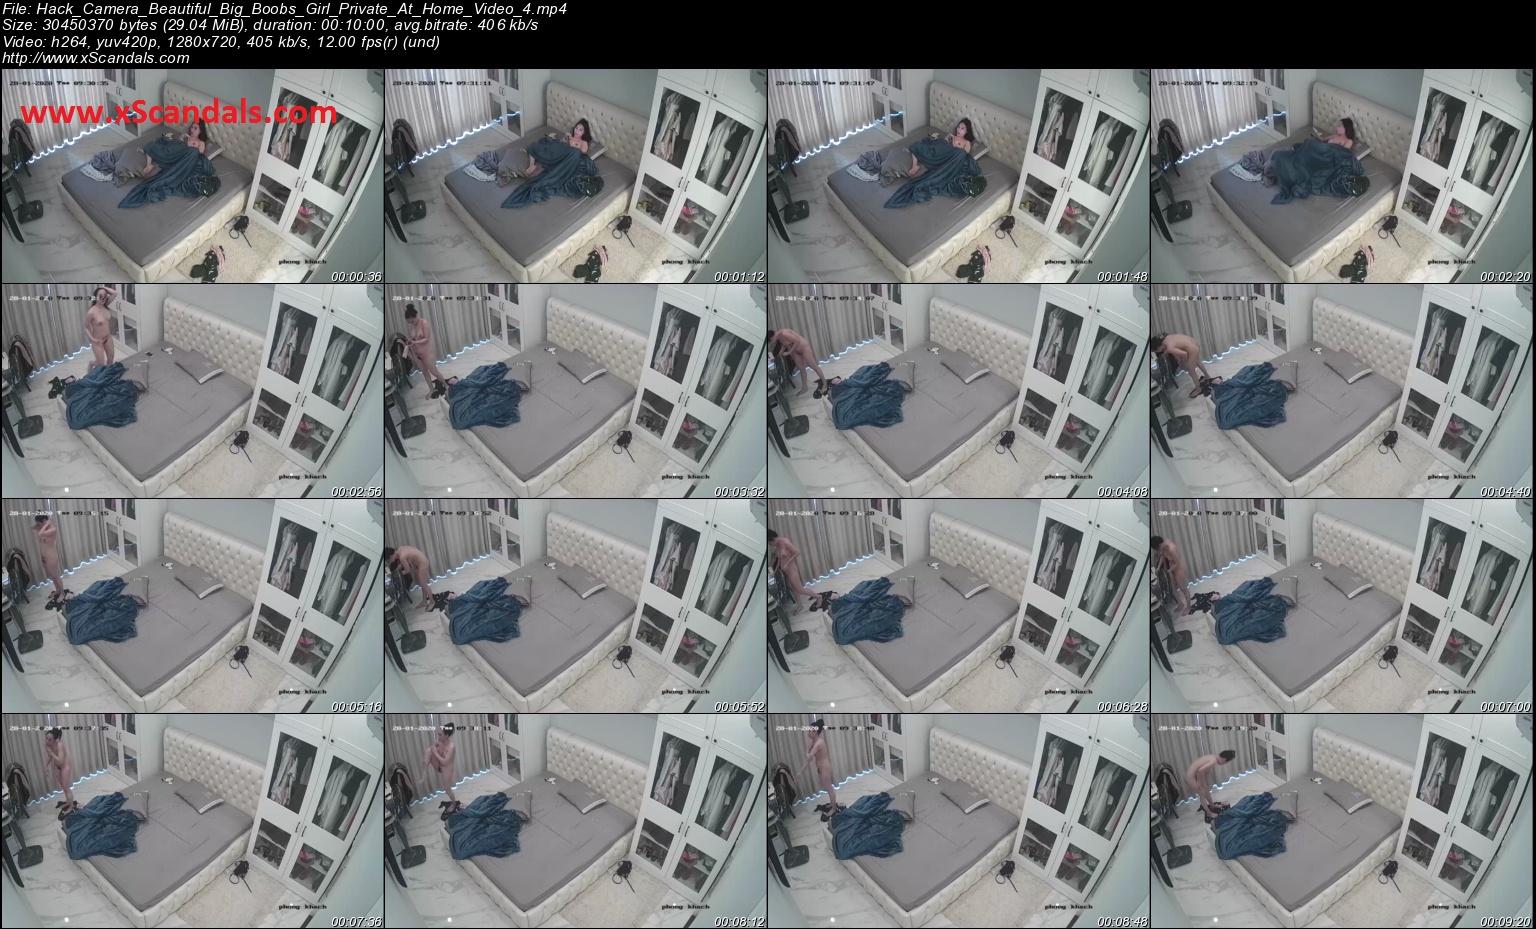 Hack_Camera_Beautiful_Big_Boobs_Girl_Private_At_Home_Video_4.jpeg